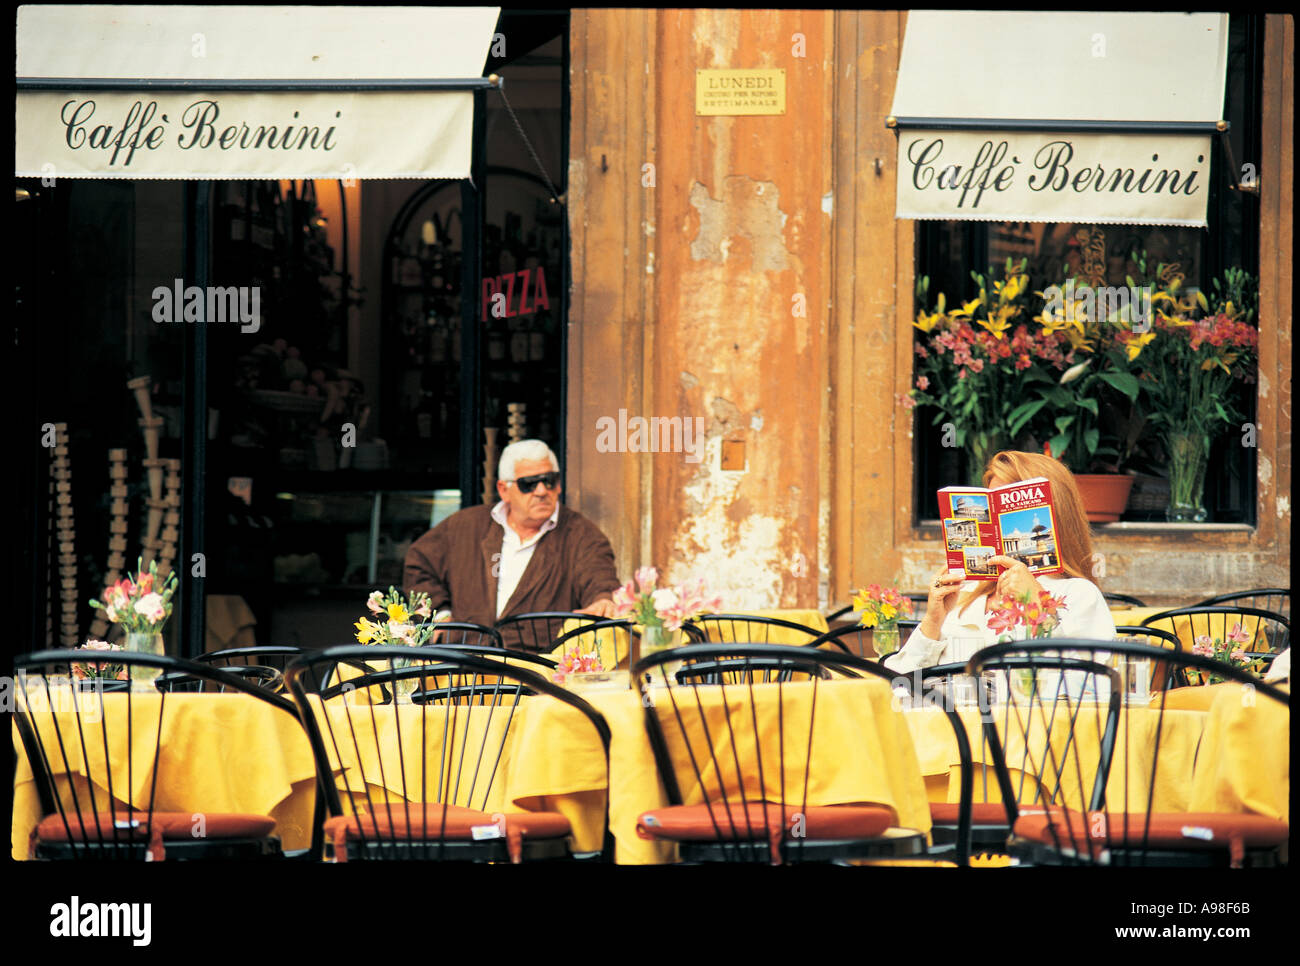 Cafe Bernini Rome Italy - Stock Image